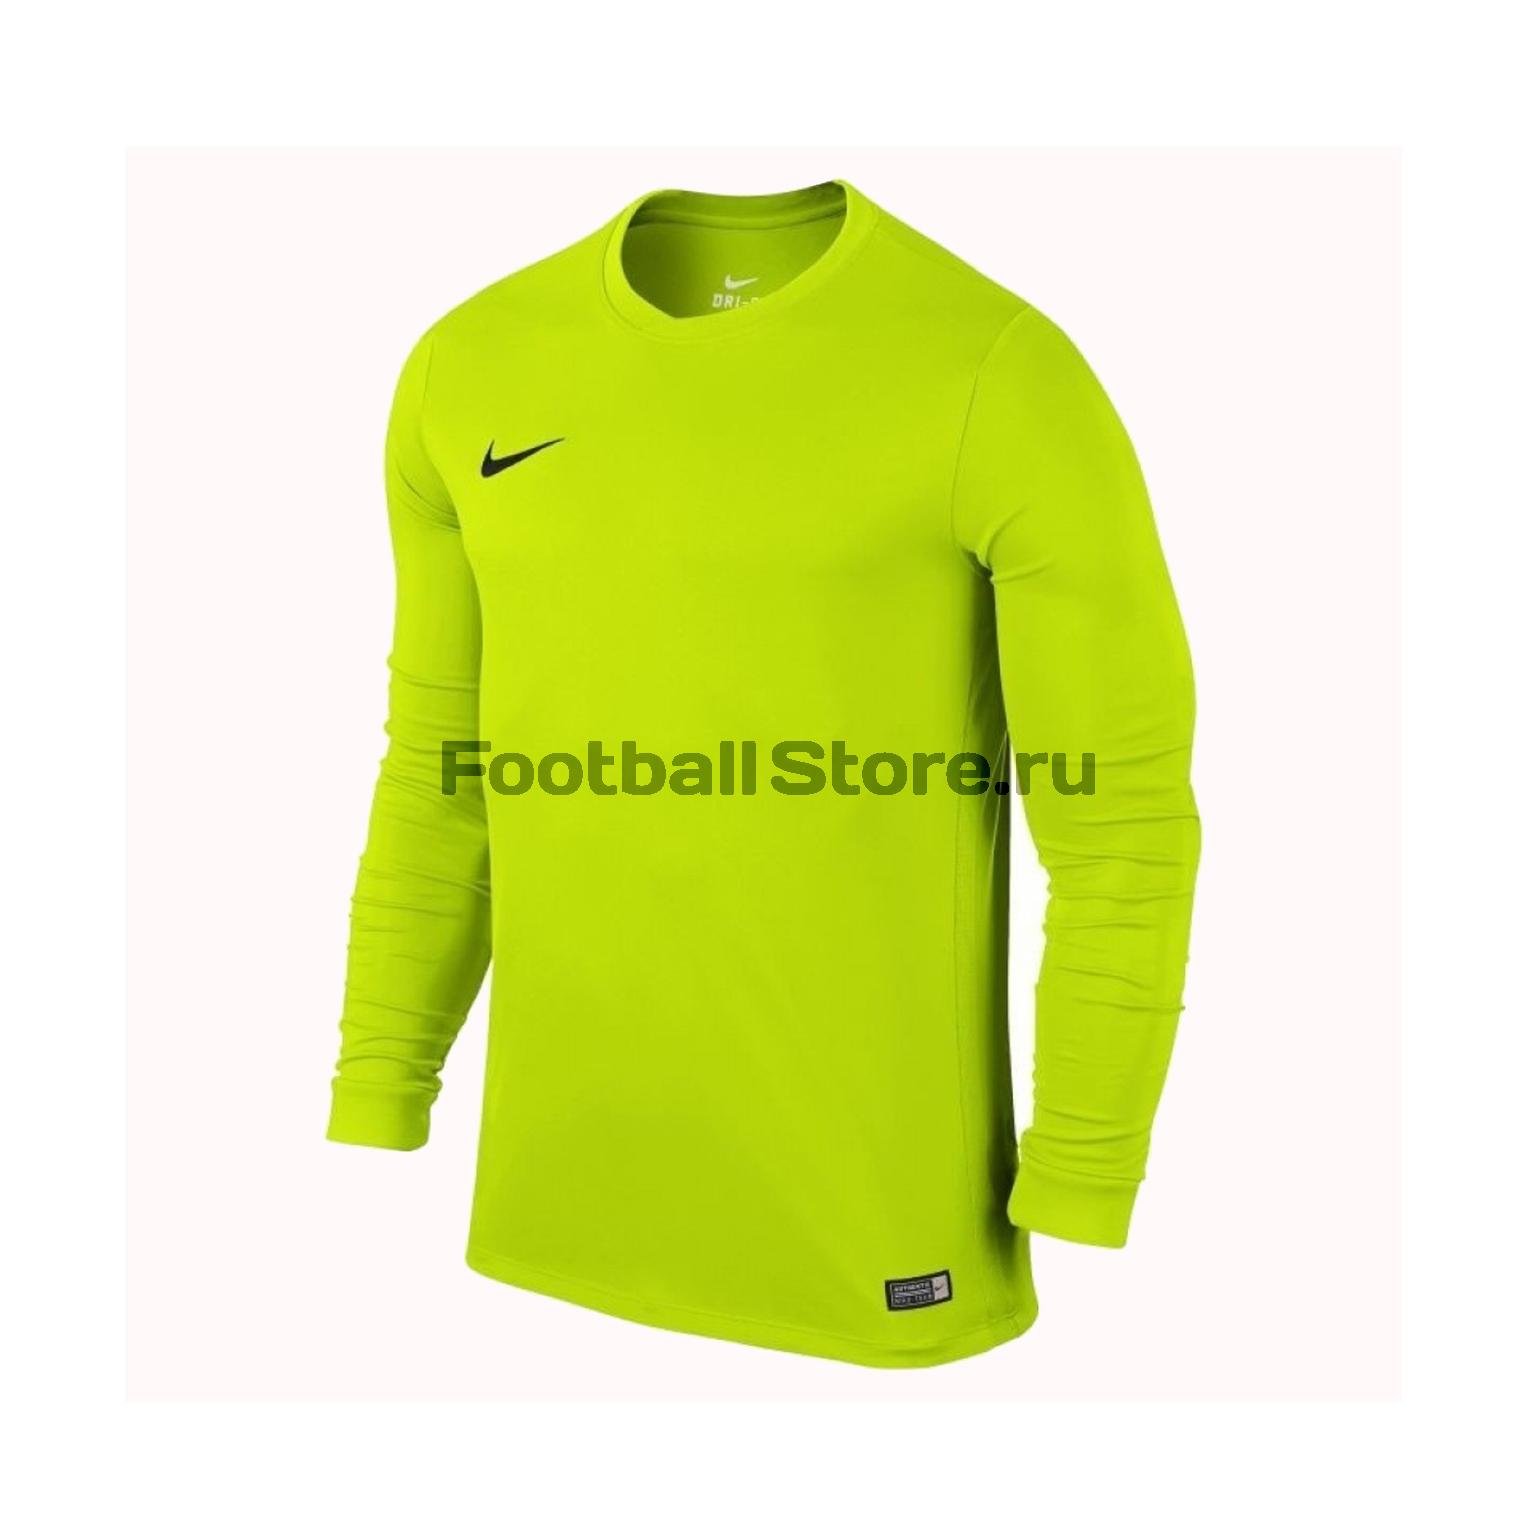 Футболка игровая Nike LS Park VI JSY 725884-702 футболка игровая nike dry tiempo prem jsy ss 894230 057